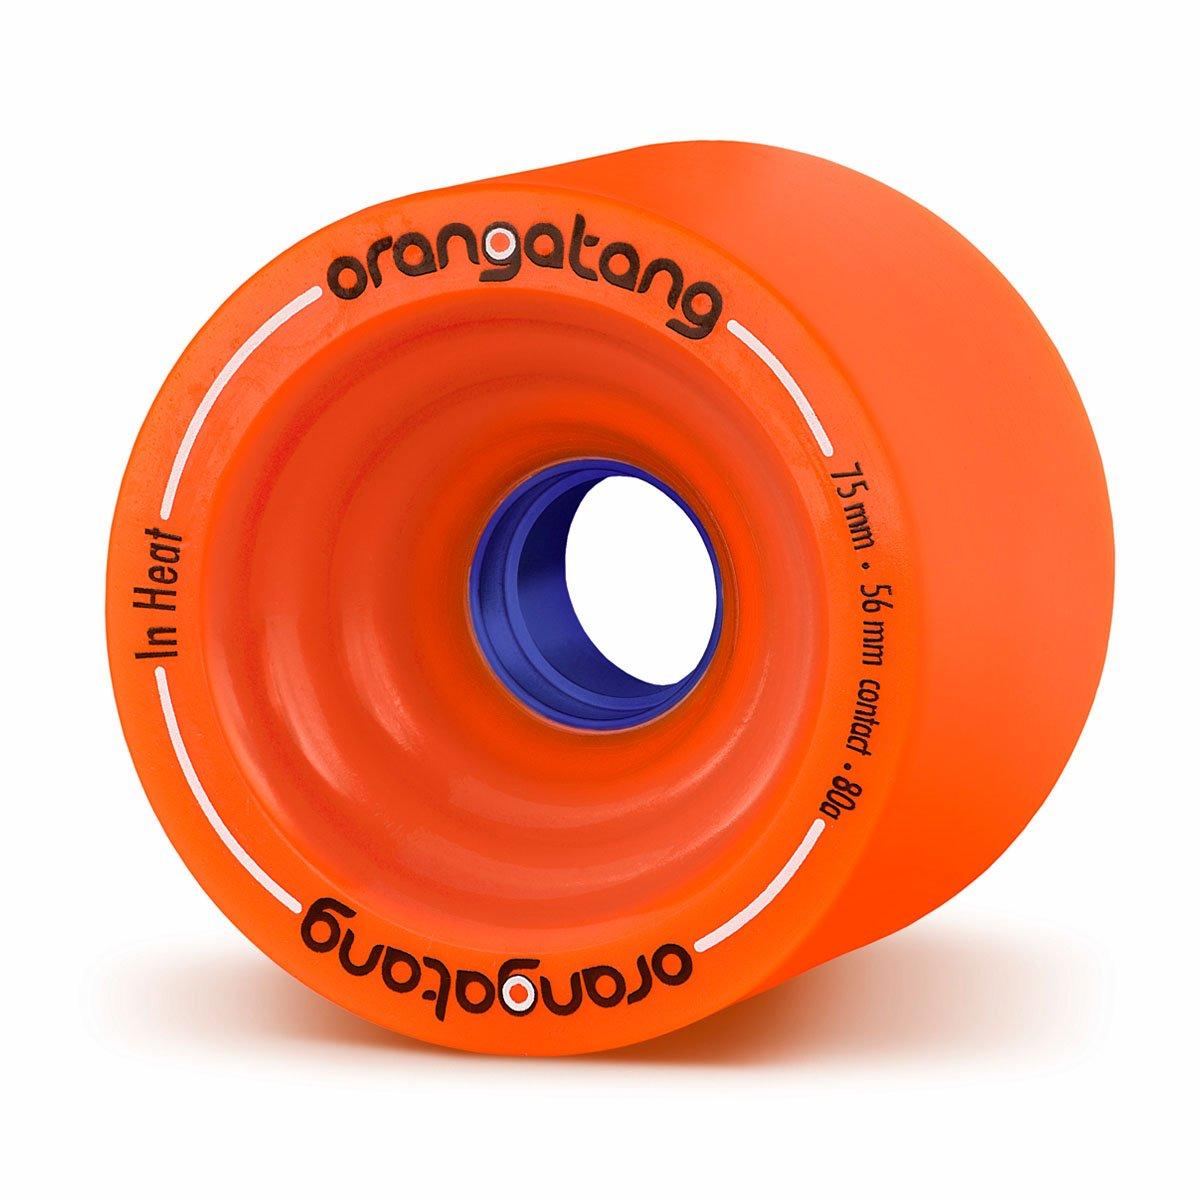 Orangatang in Heat 75 mm 80a Downhill Longboard Skateboard Cruising Wheels (Orange, Set of 4) by Orangatang